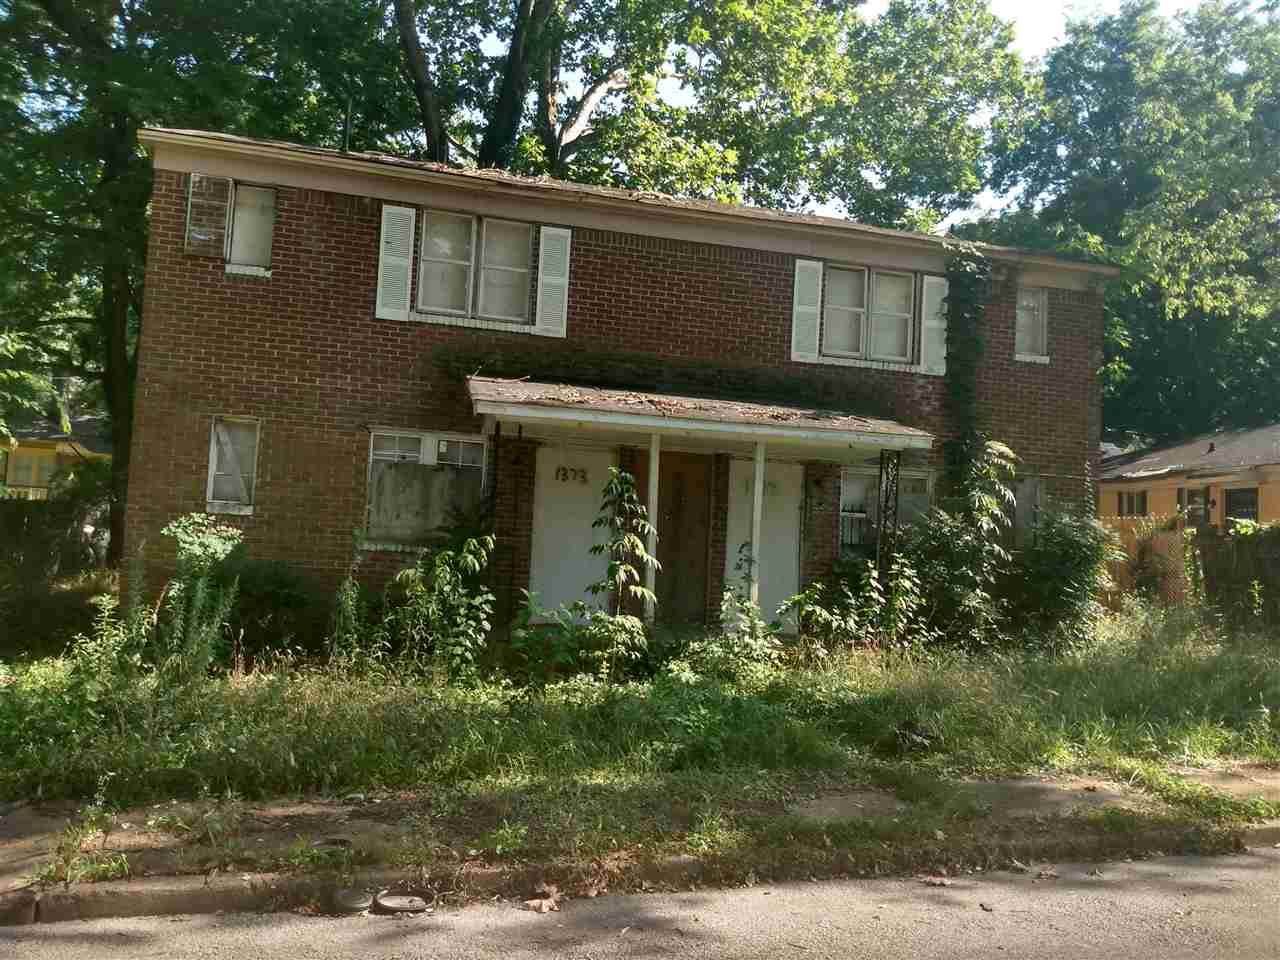 1373 Richmond St - Photo 1